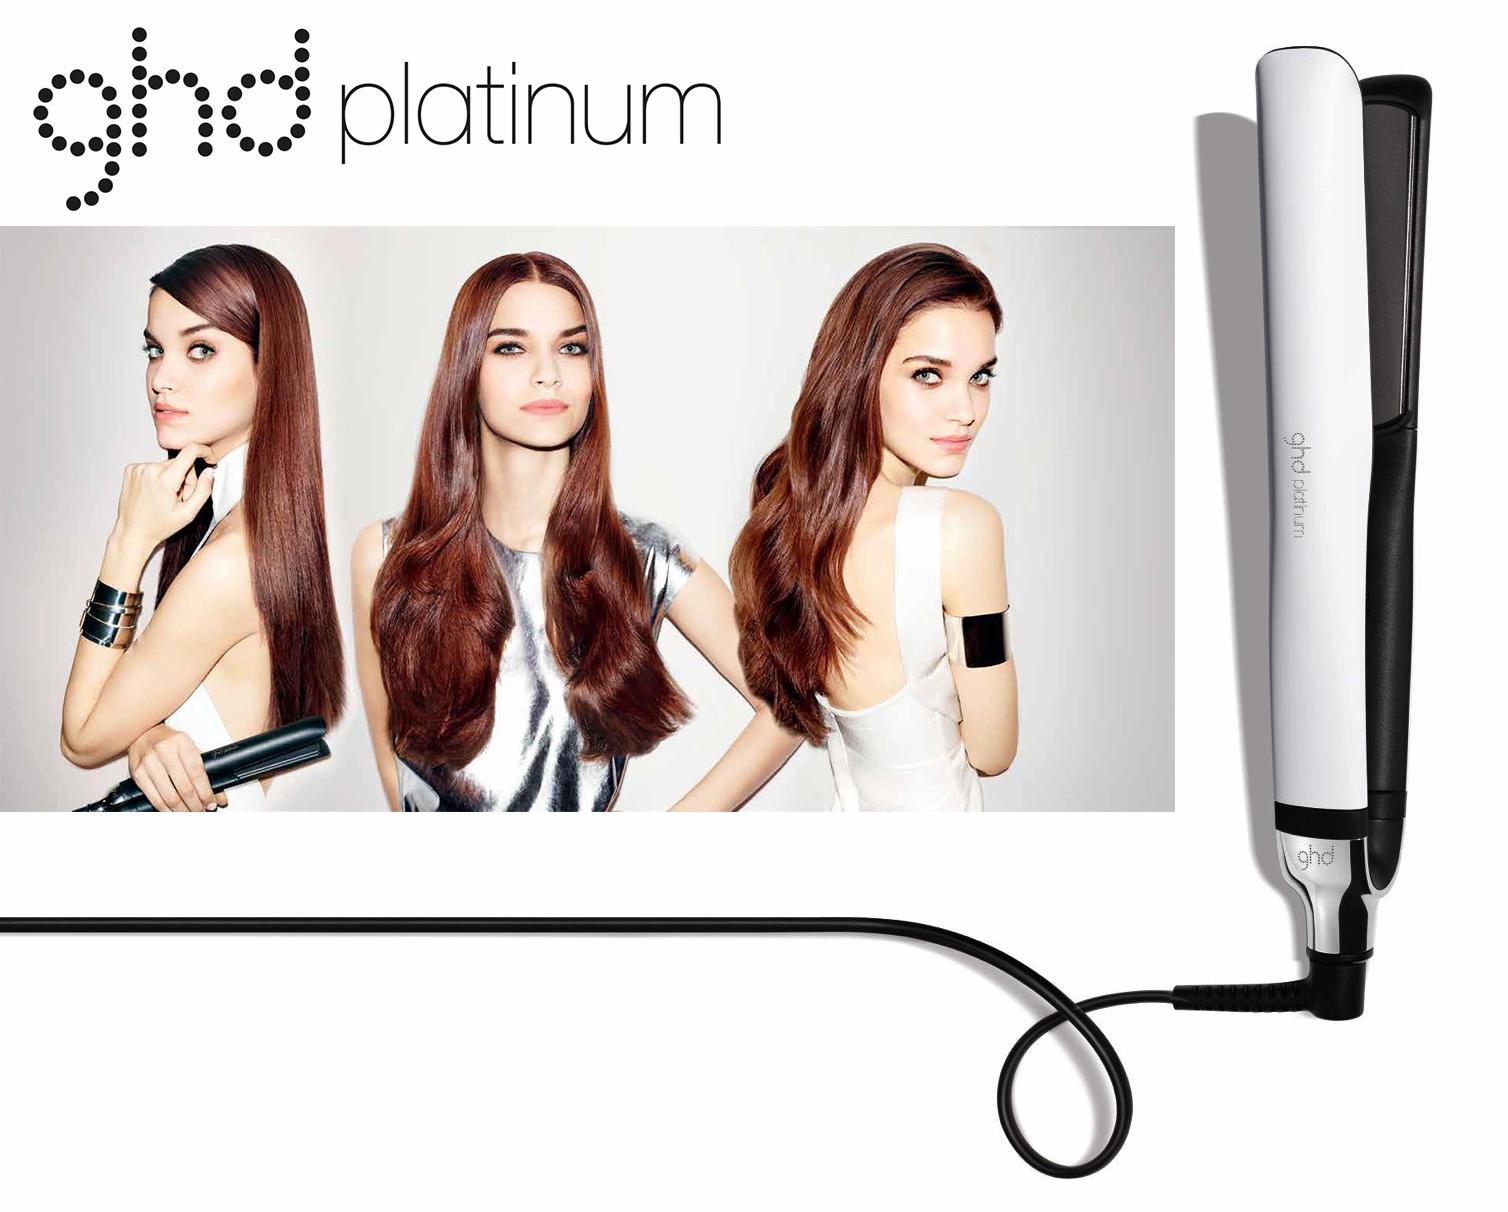 ghd_platinum_middle_logo.jpg